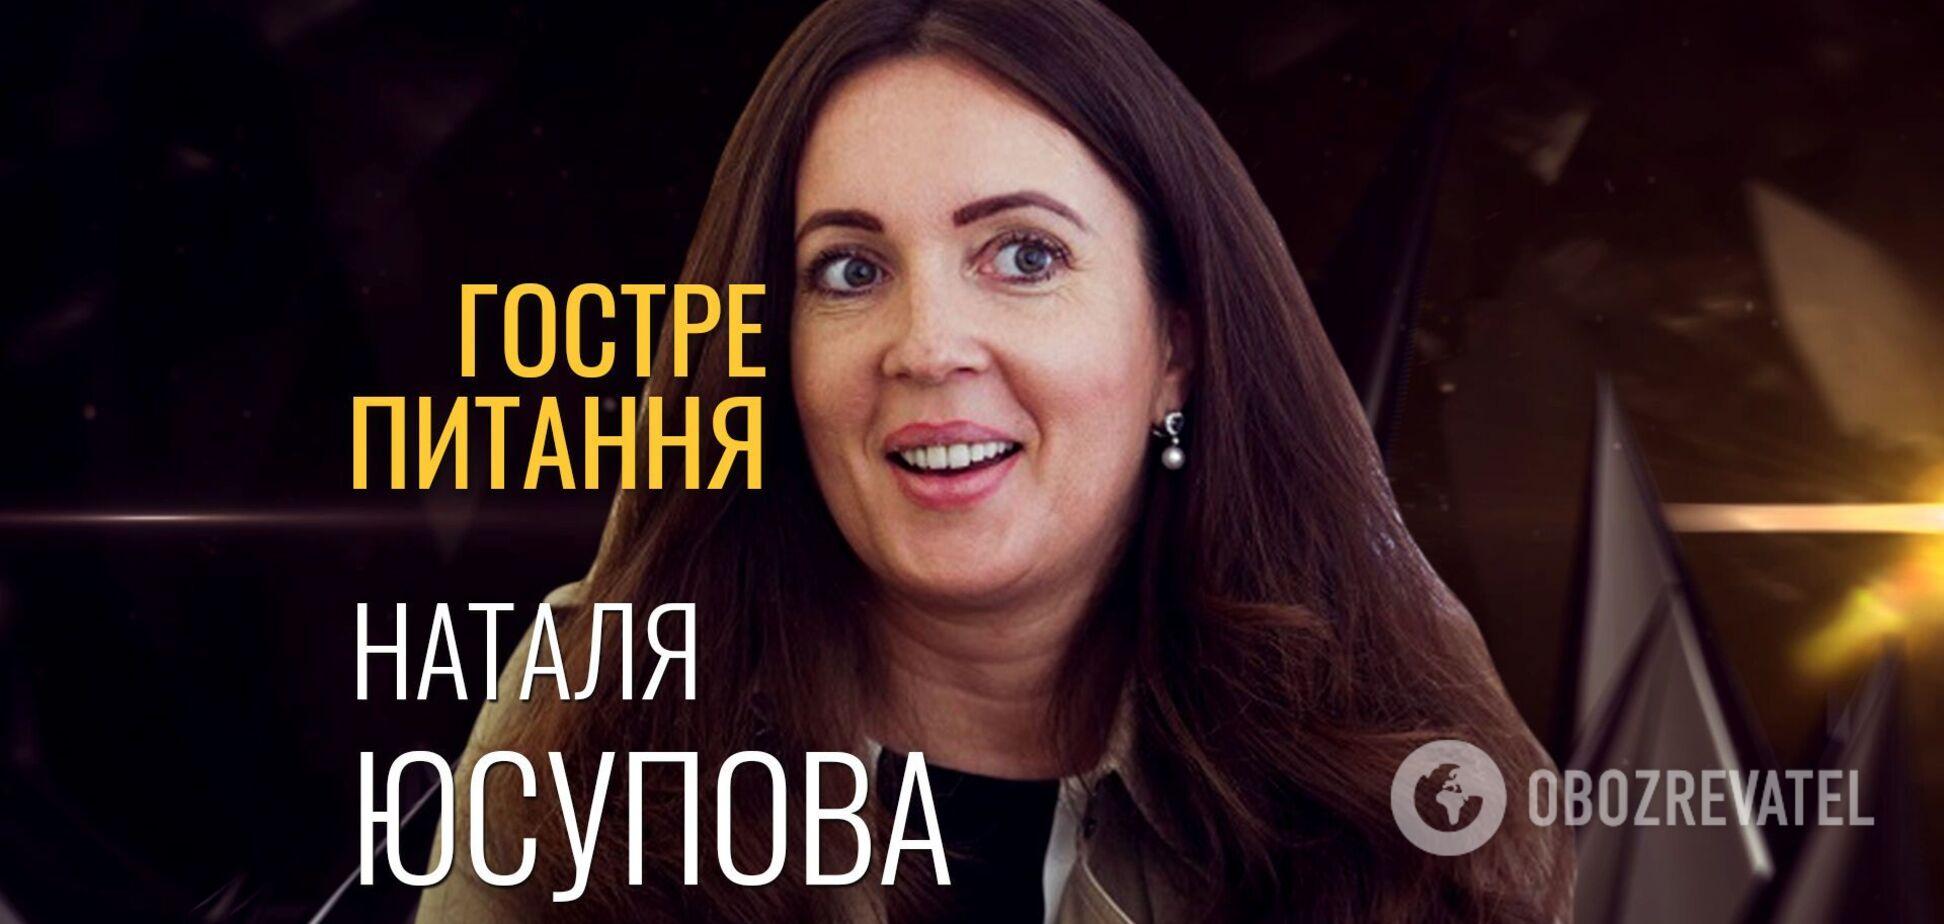 Наталья Юсупова | Гостре питання